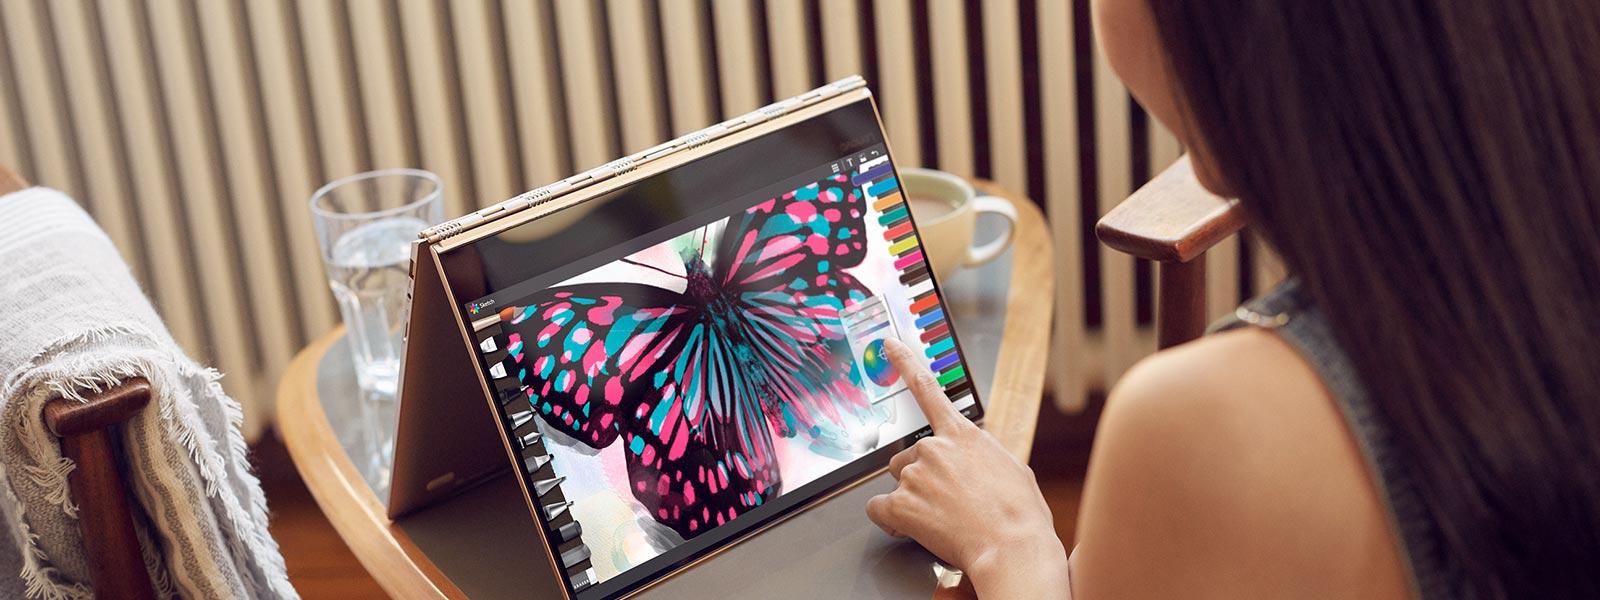 Woman using the touchscreen of a Lenovo YOGA 910